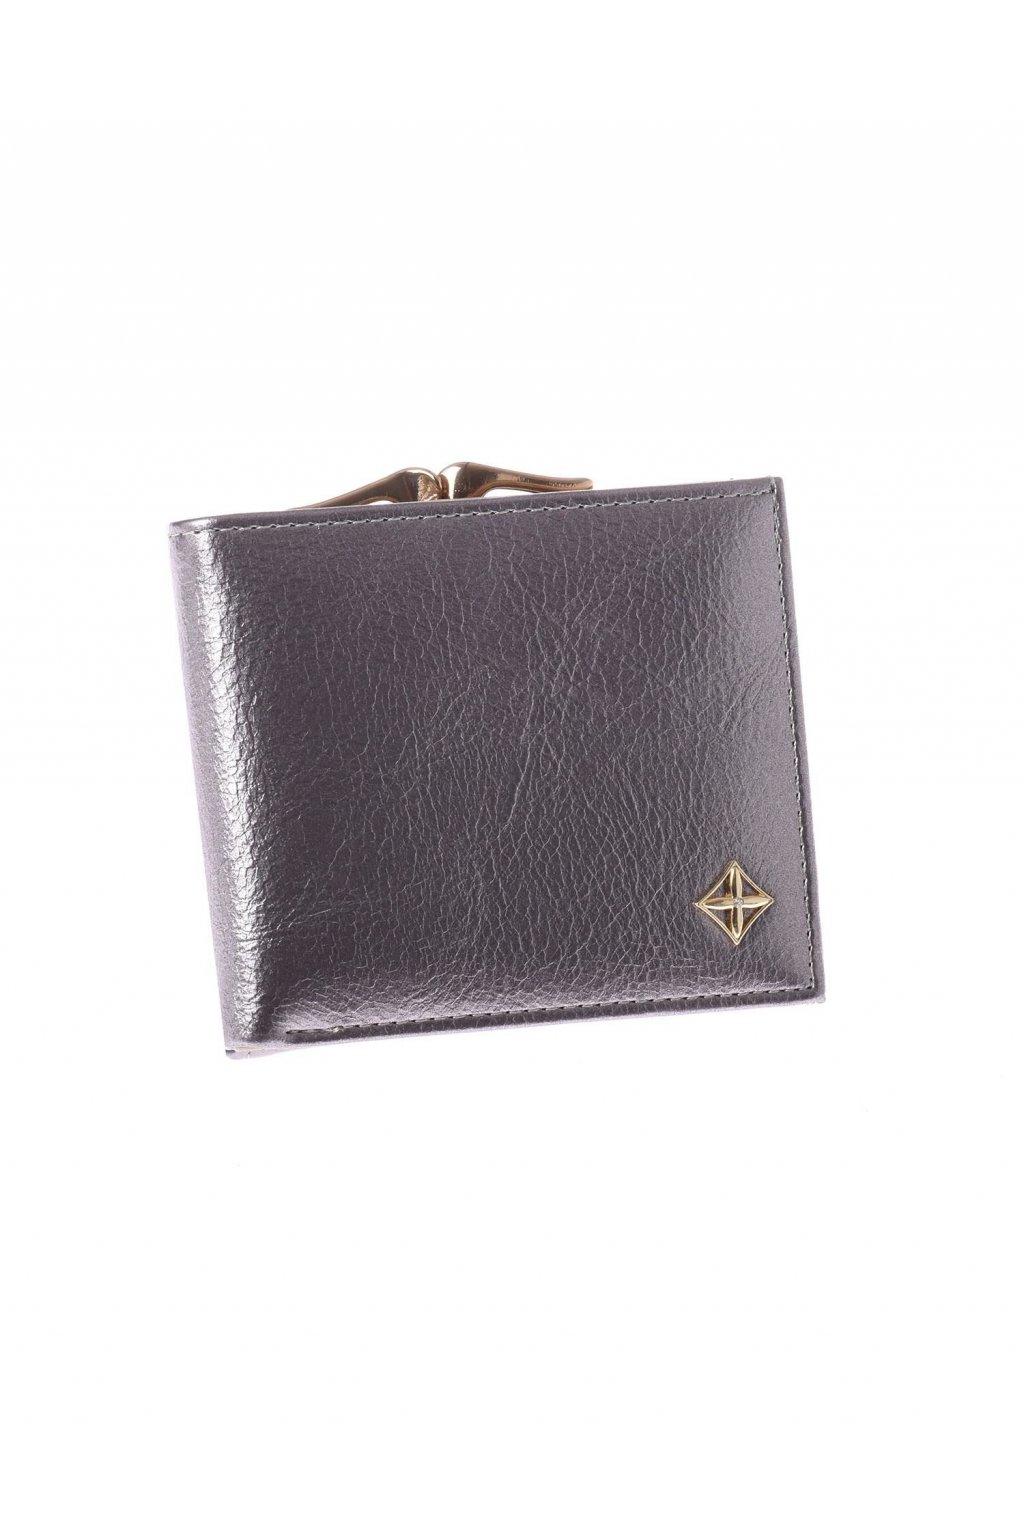 Peňaženka kód CE-PR-SF-1814.09